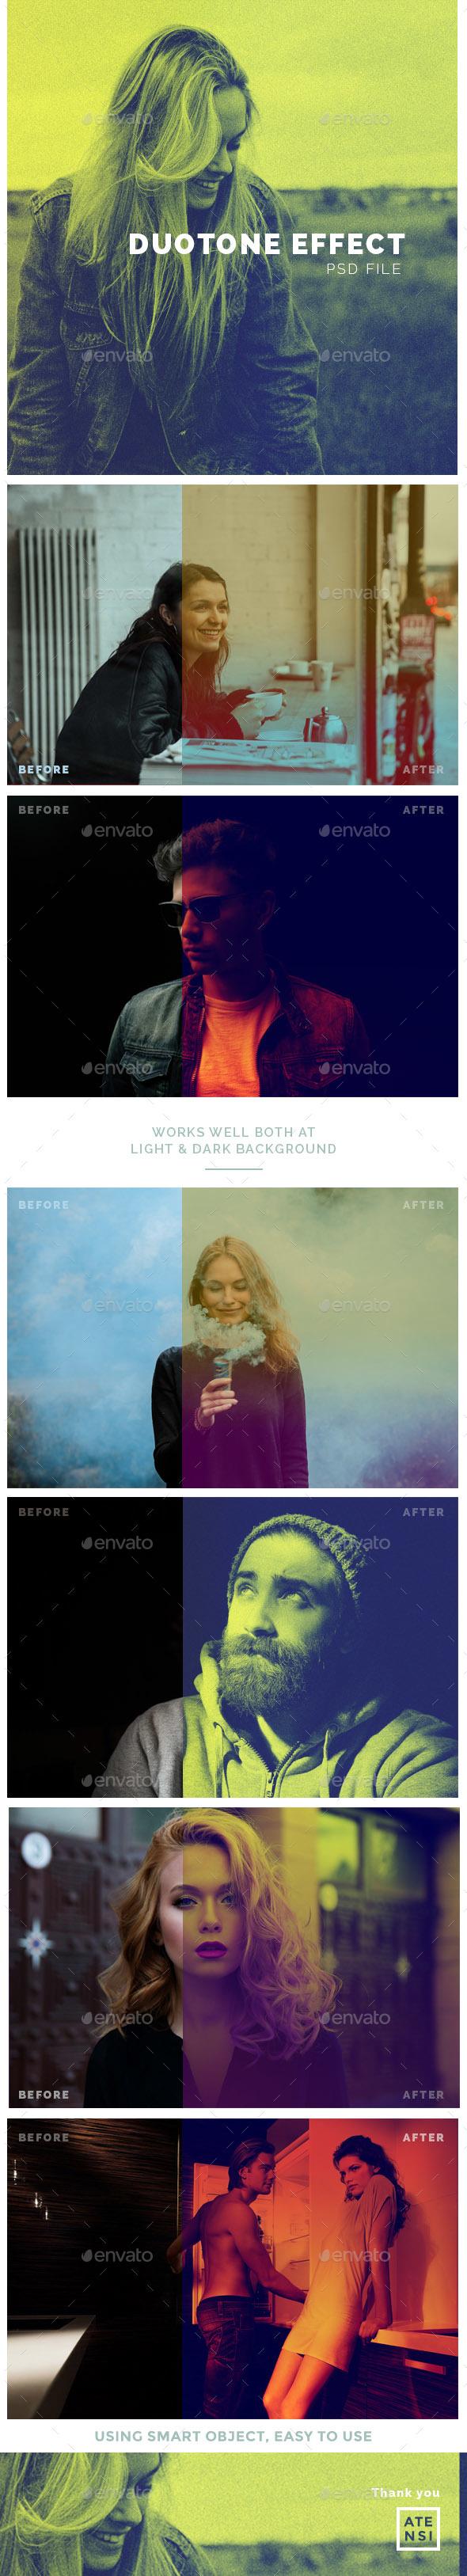 Duotone Photo Effect - Urban Photo Templates